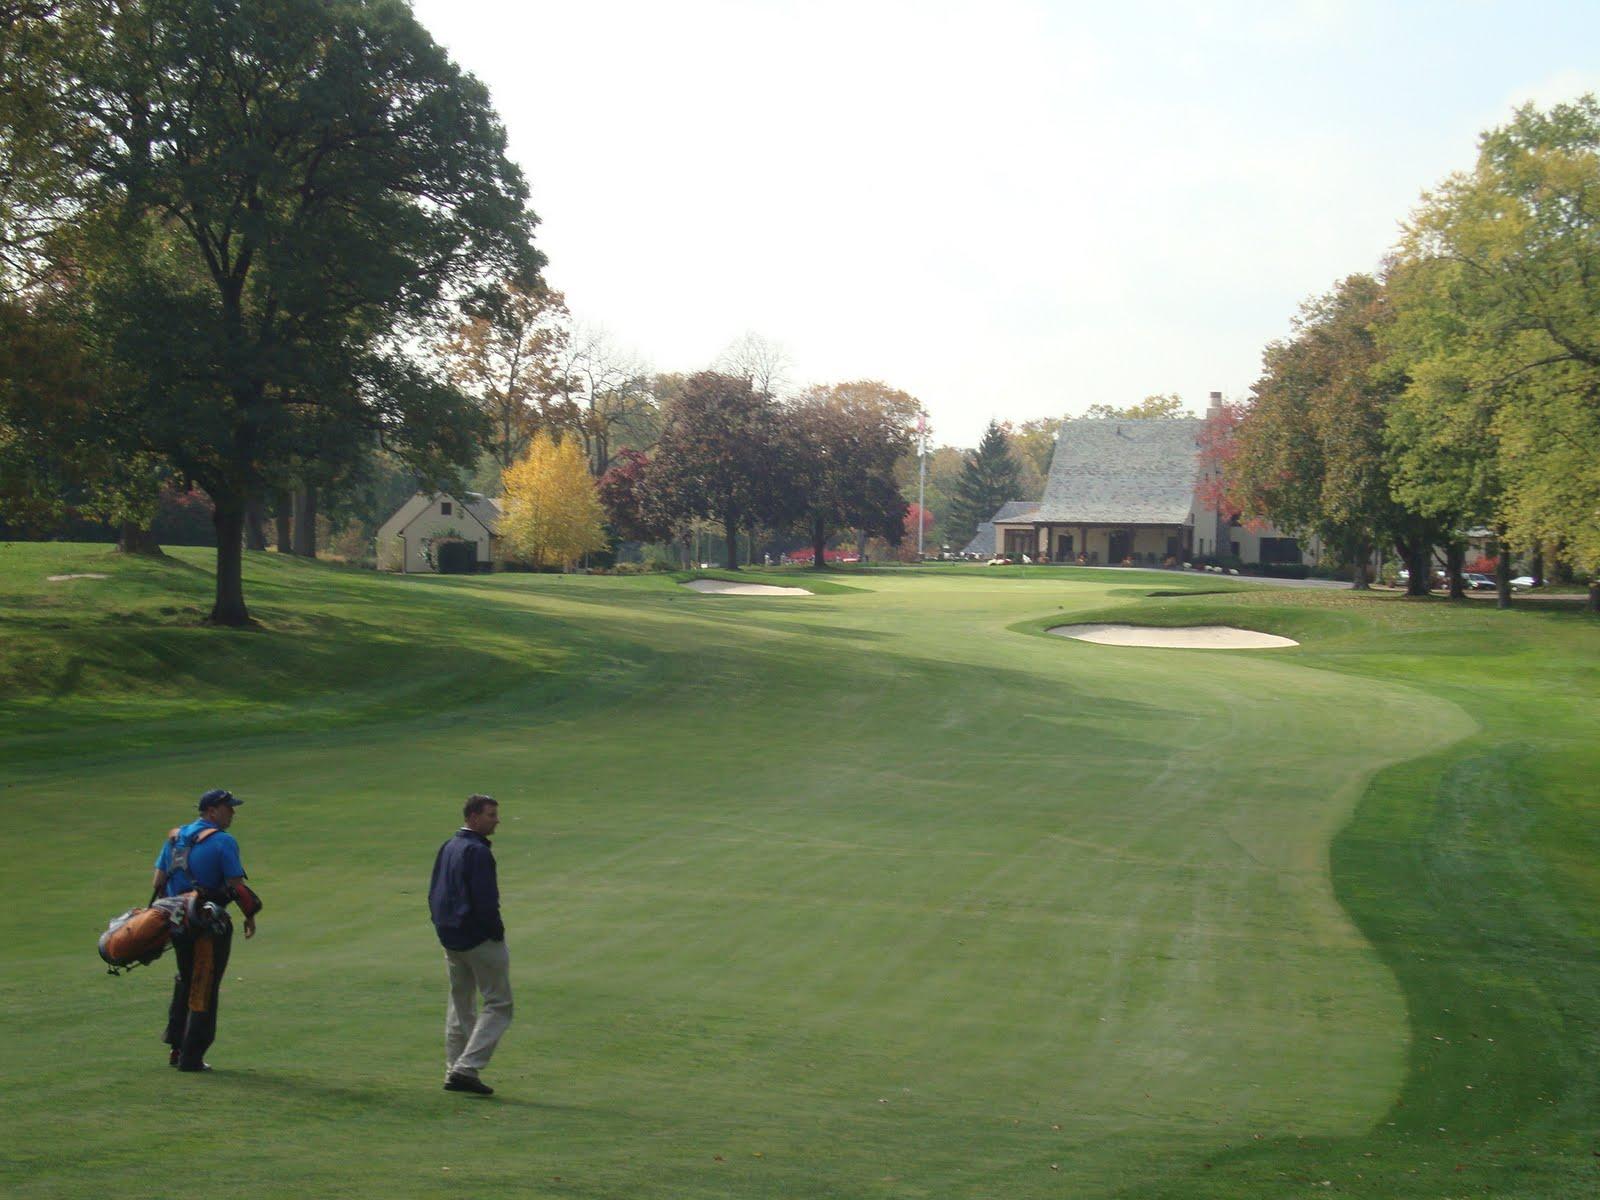 ian andrew s golf design blog golf s most influential architects golf s most influential architects